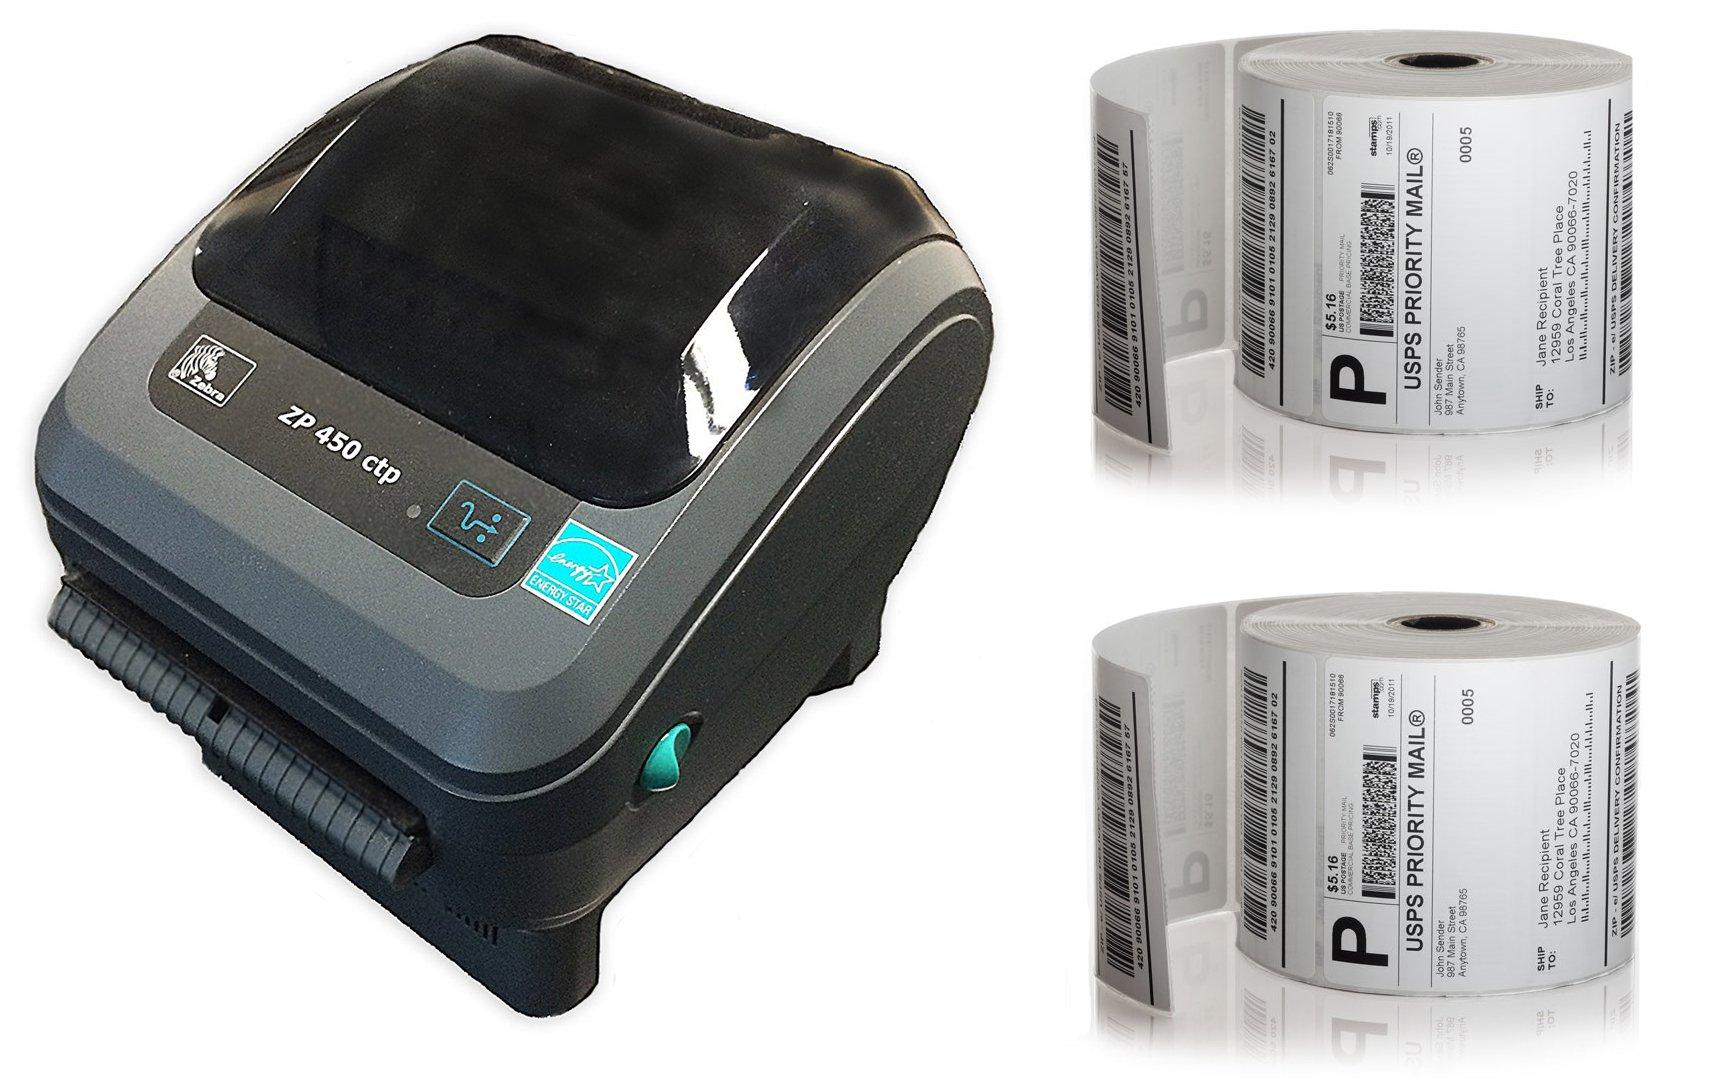 Zebra ZP-450 CTP Direct Thermal Printer + 1,000 4x6 Labels (JUMBO ROLLS)